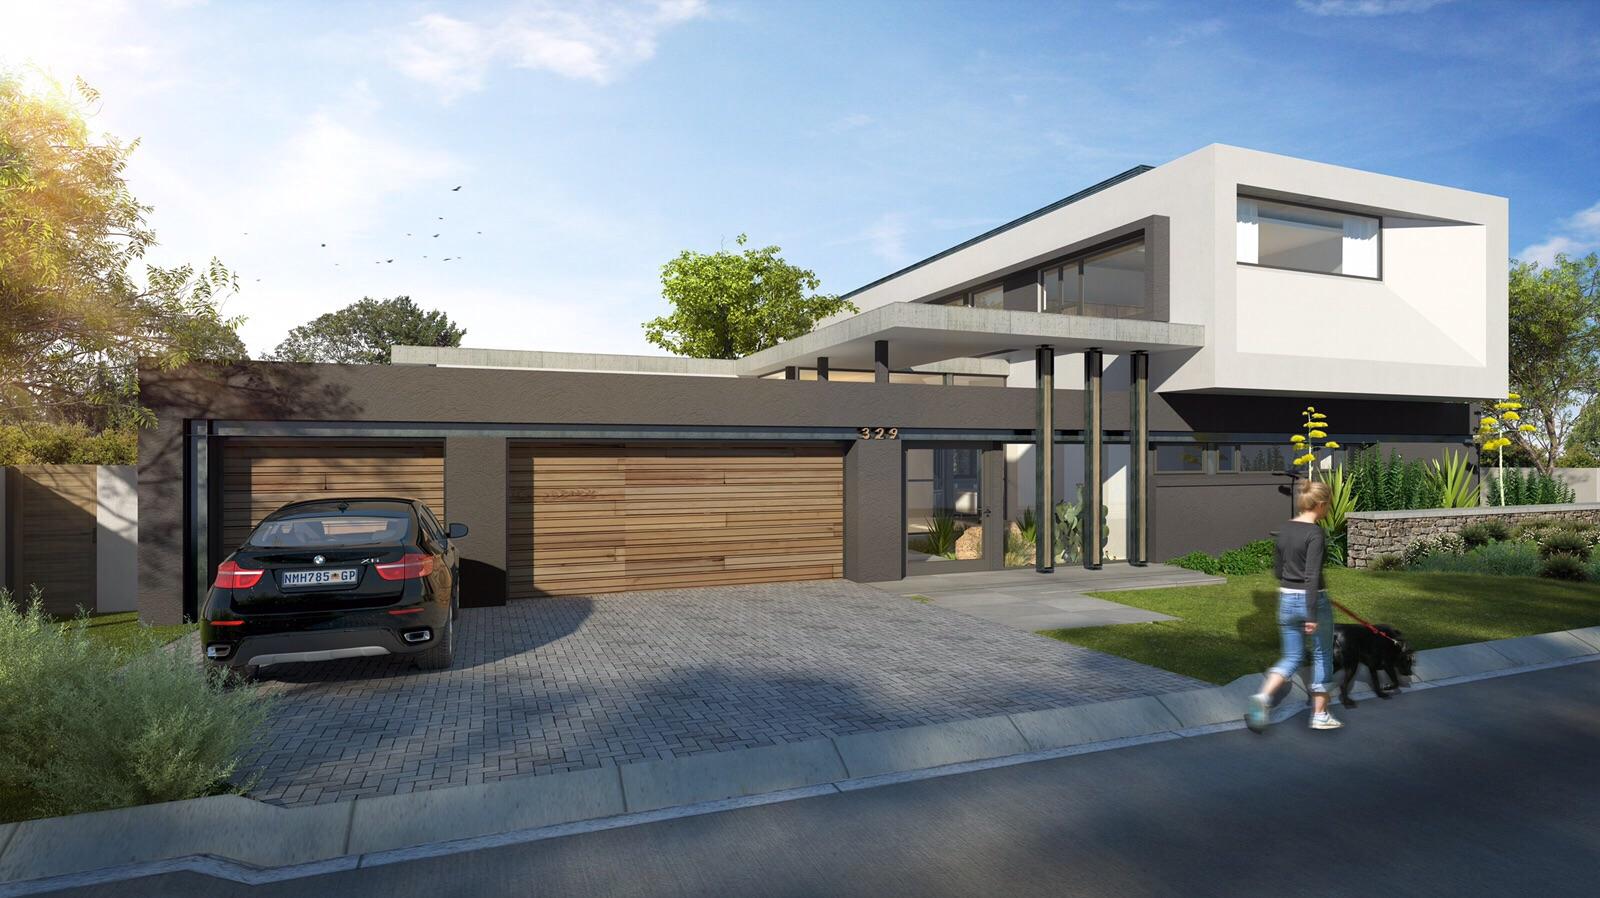 House for sale in serengeti estate kempton park for r 5 for Estate house